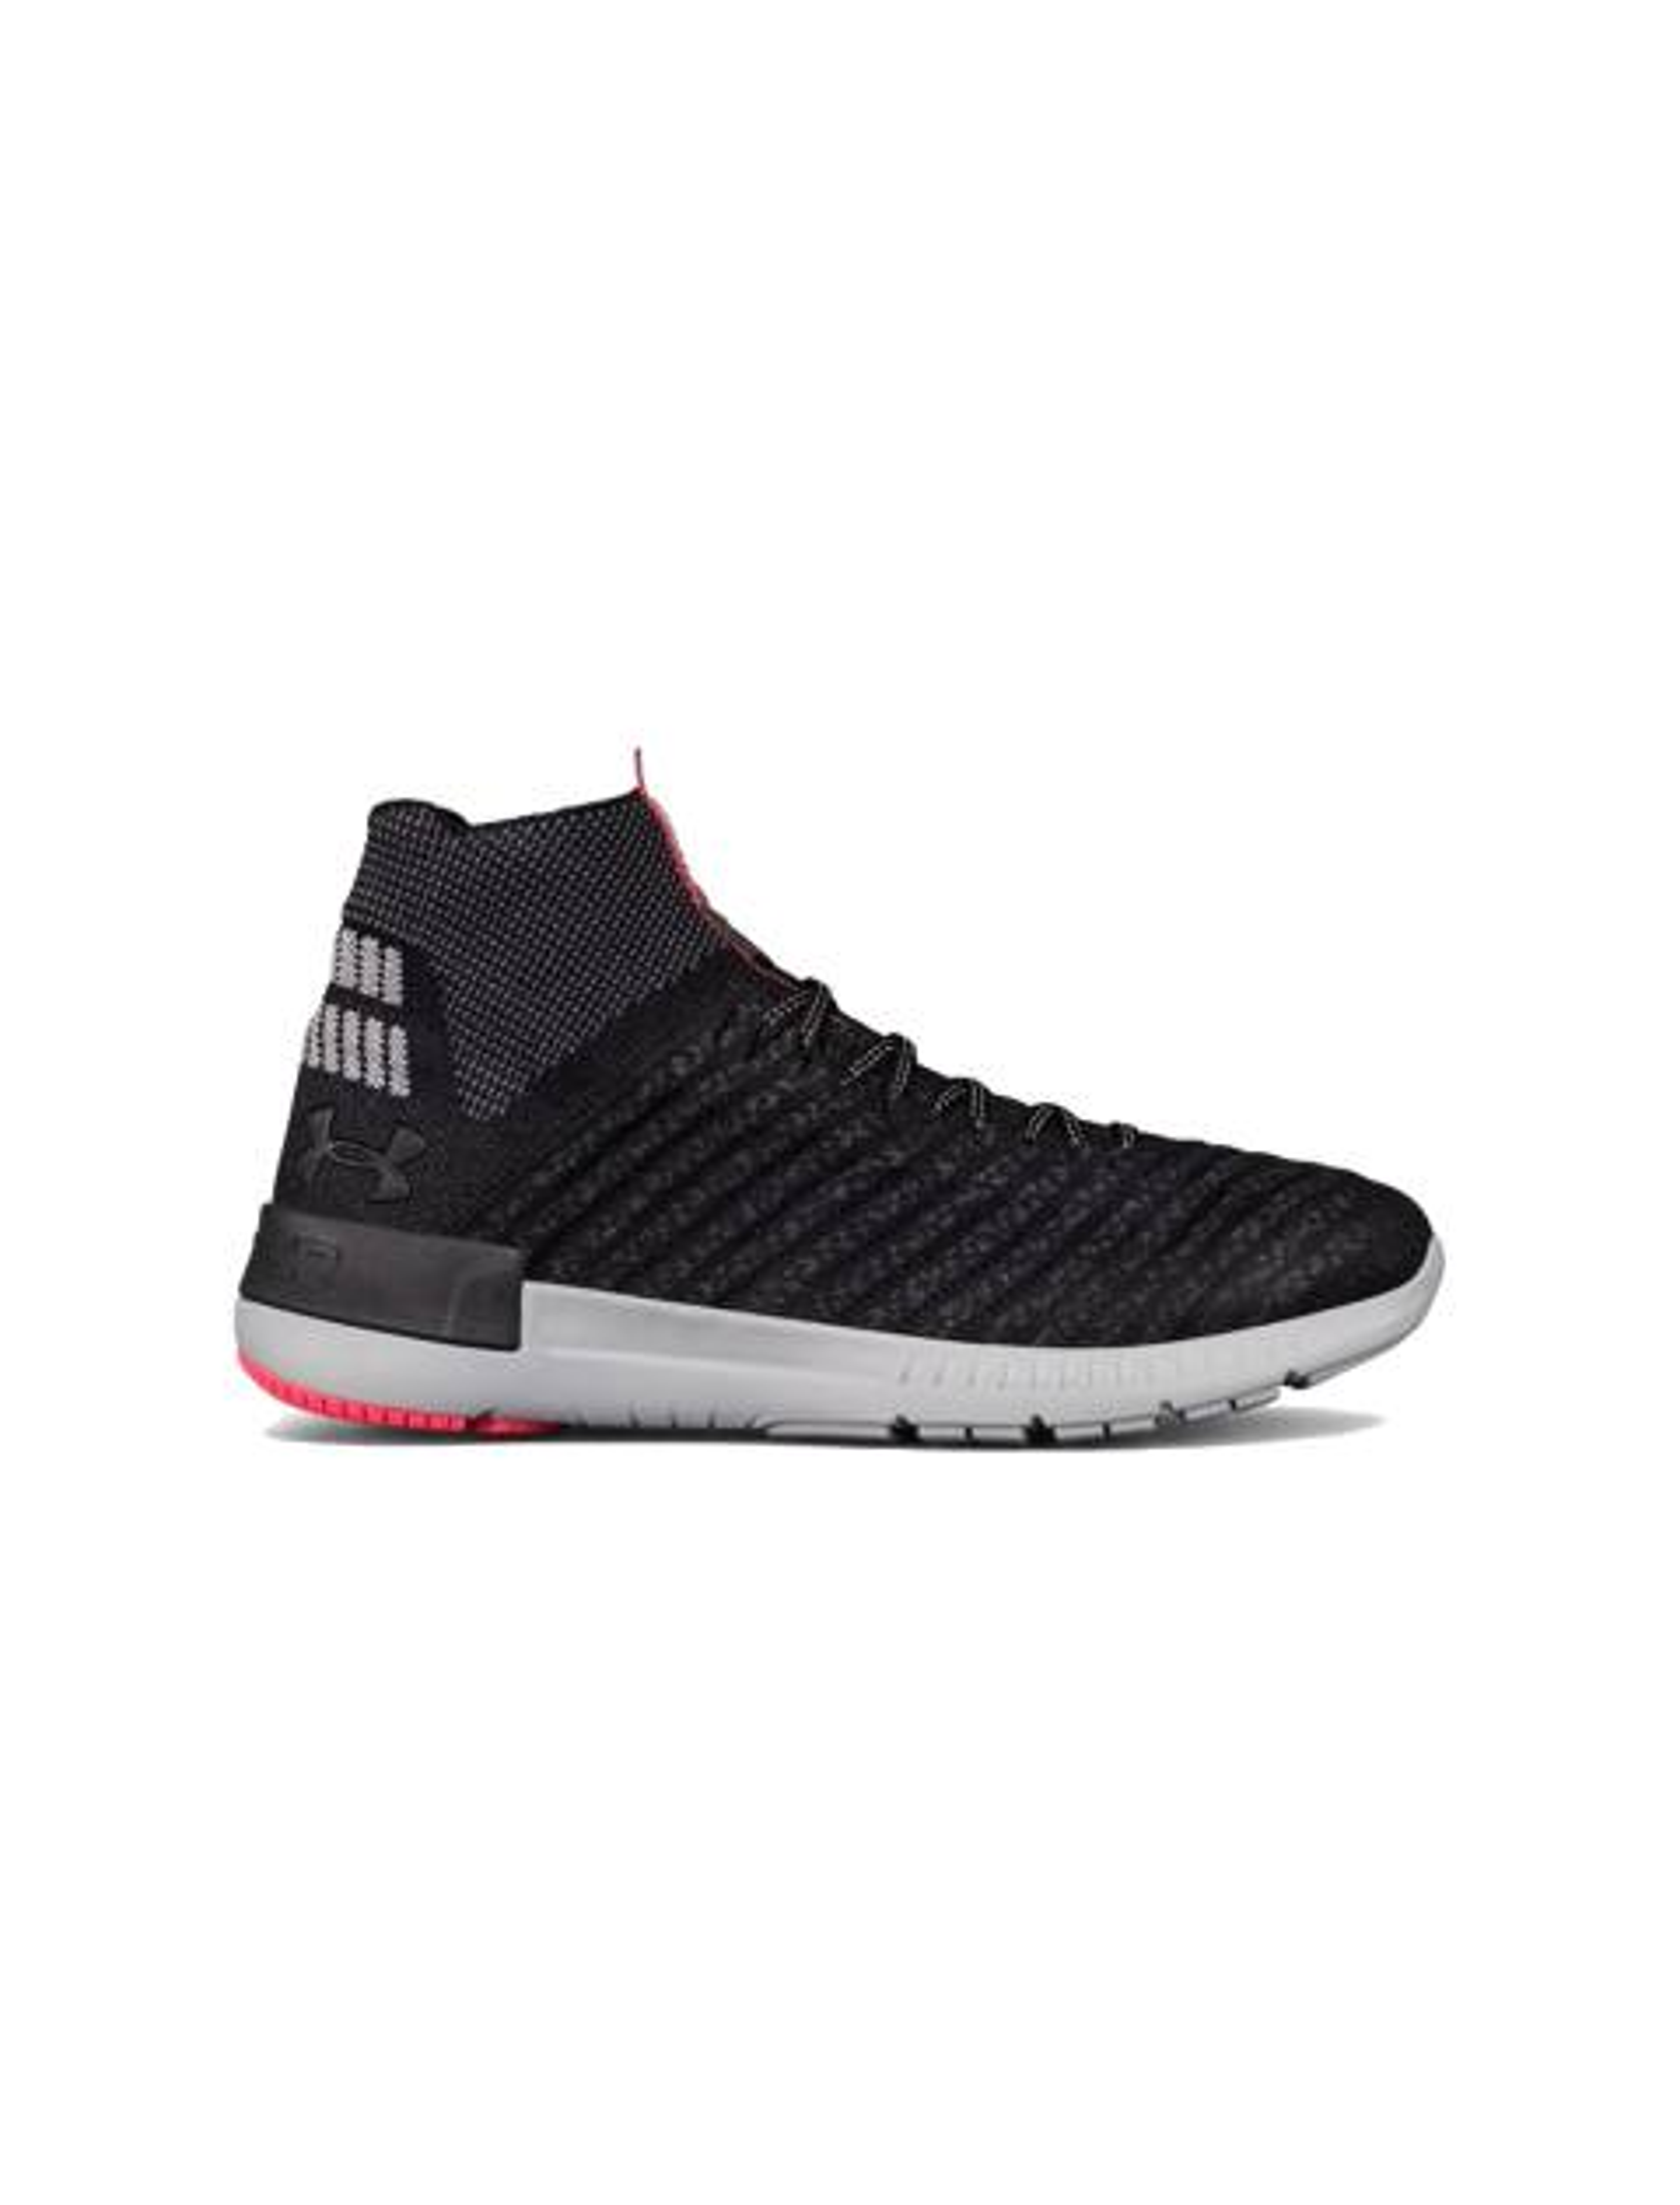 کفش دویدن بندی مردانه Highlight Delta 2 - مشکي - 1